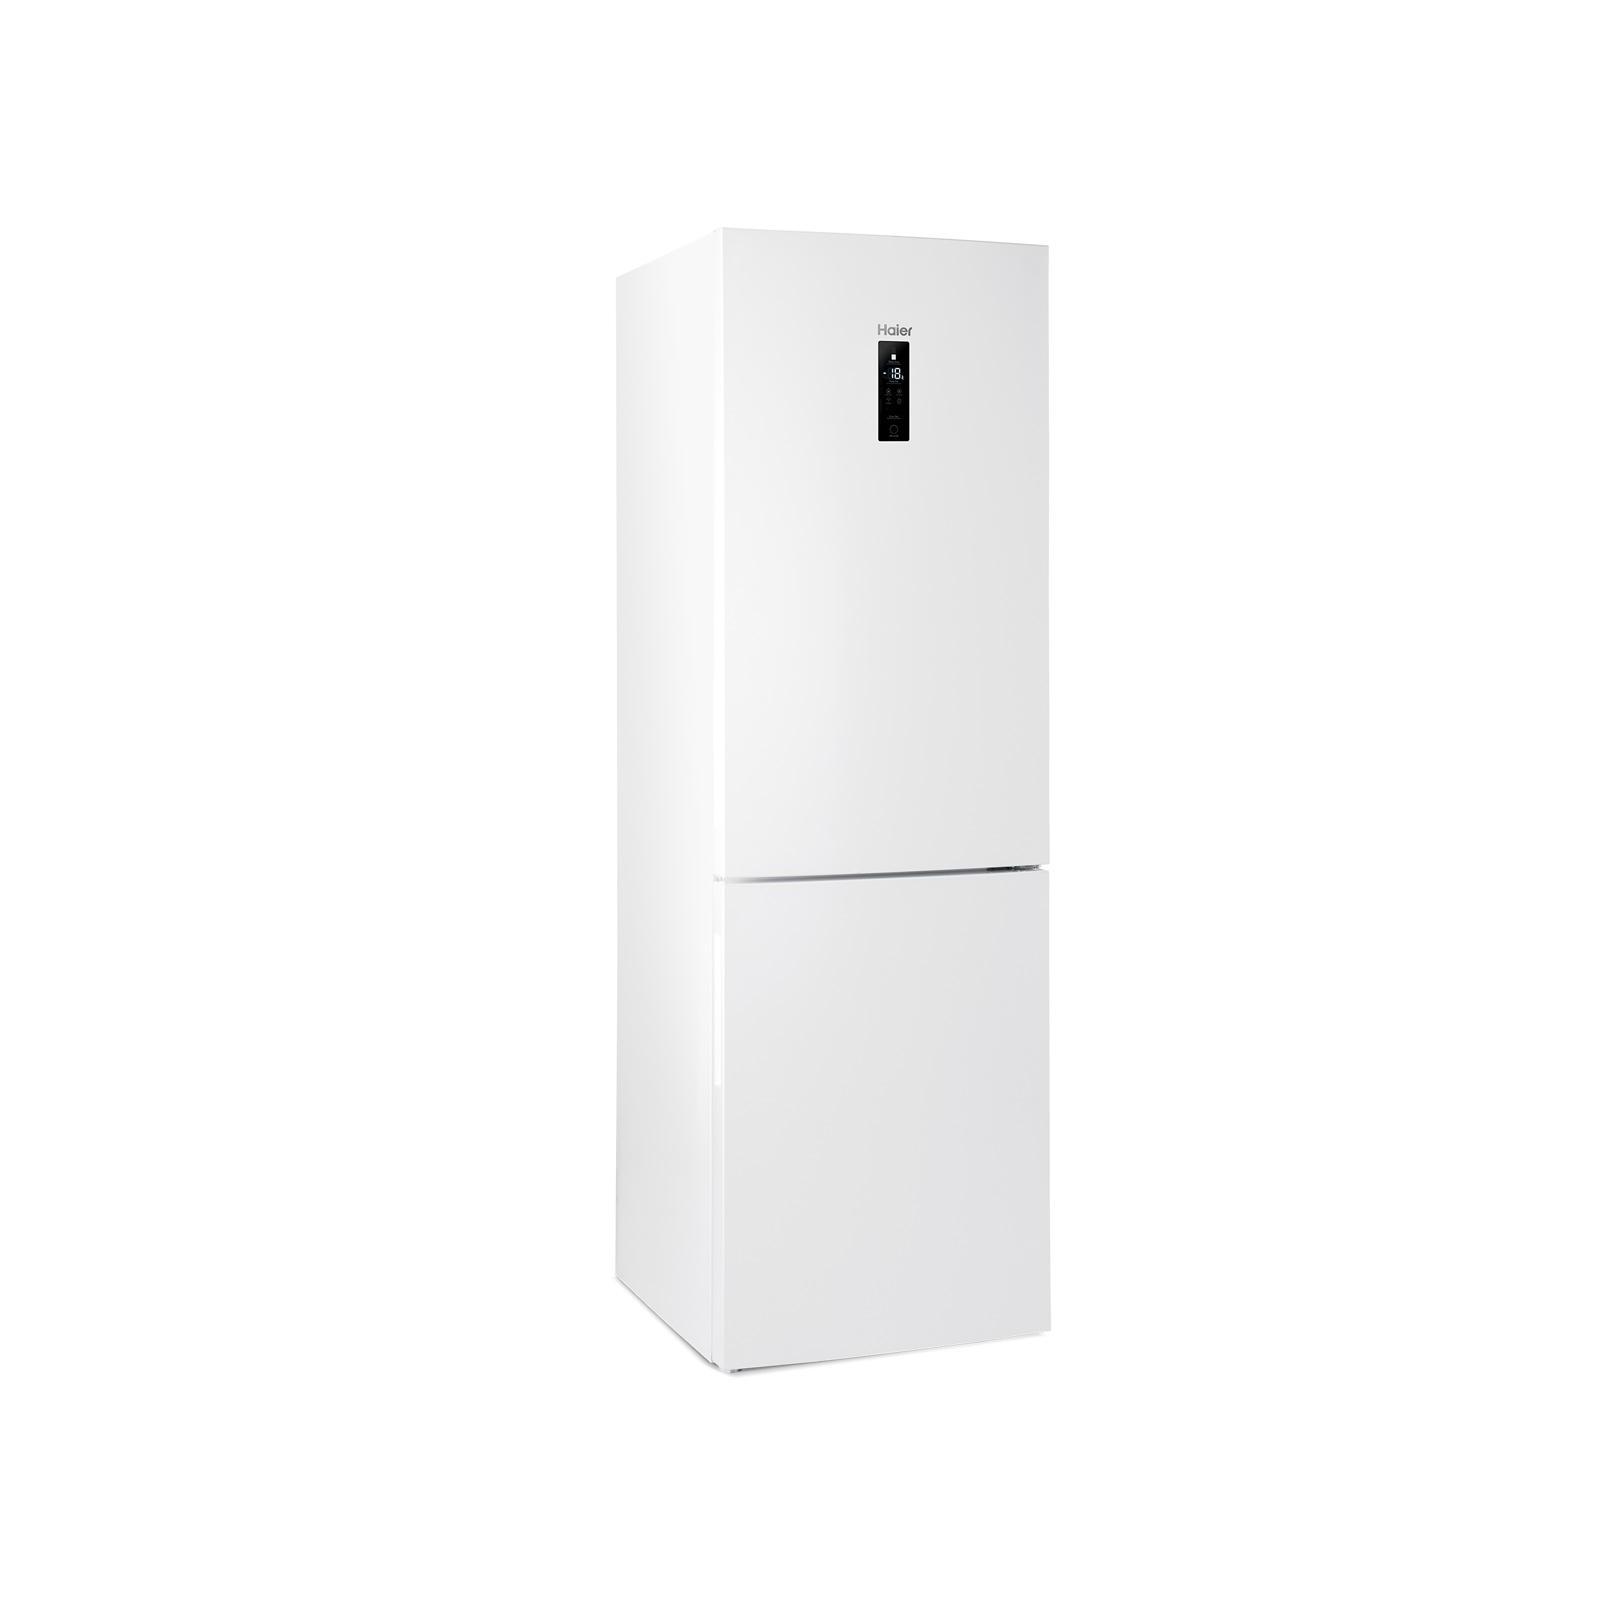 Холодильник Haier HA C2F636CWRG изображение 2